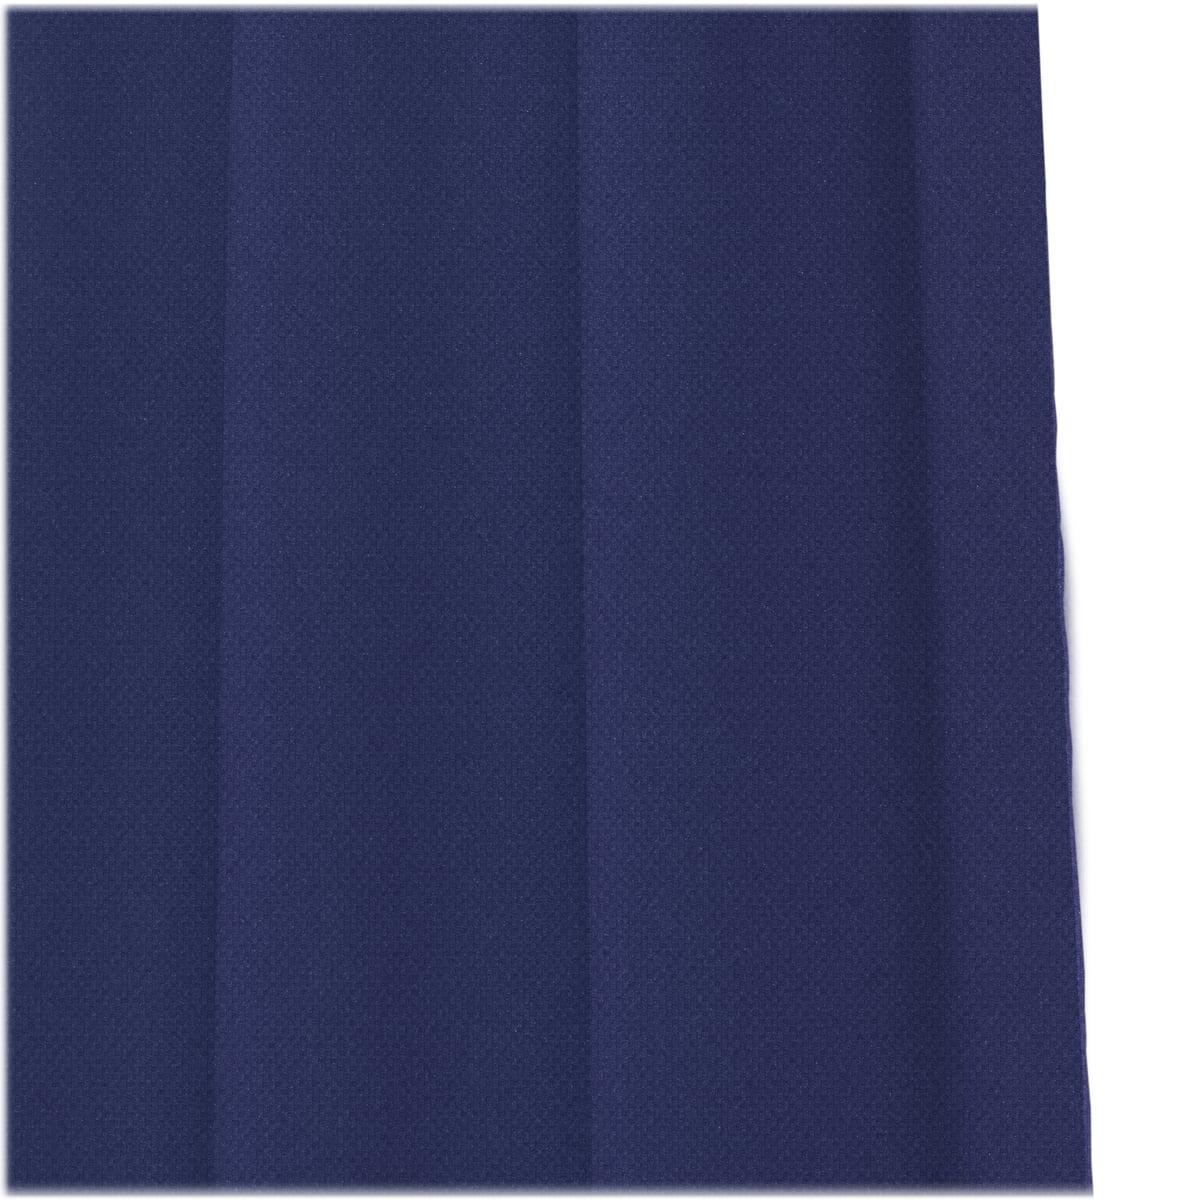 Kvadrat ready made curtain ace stoffmuster petrolblau 772 frei